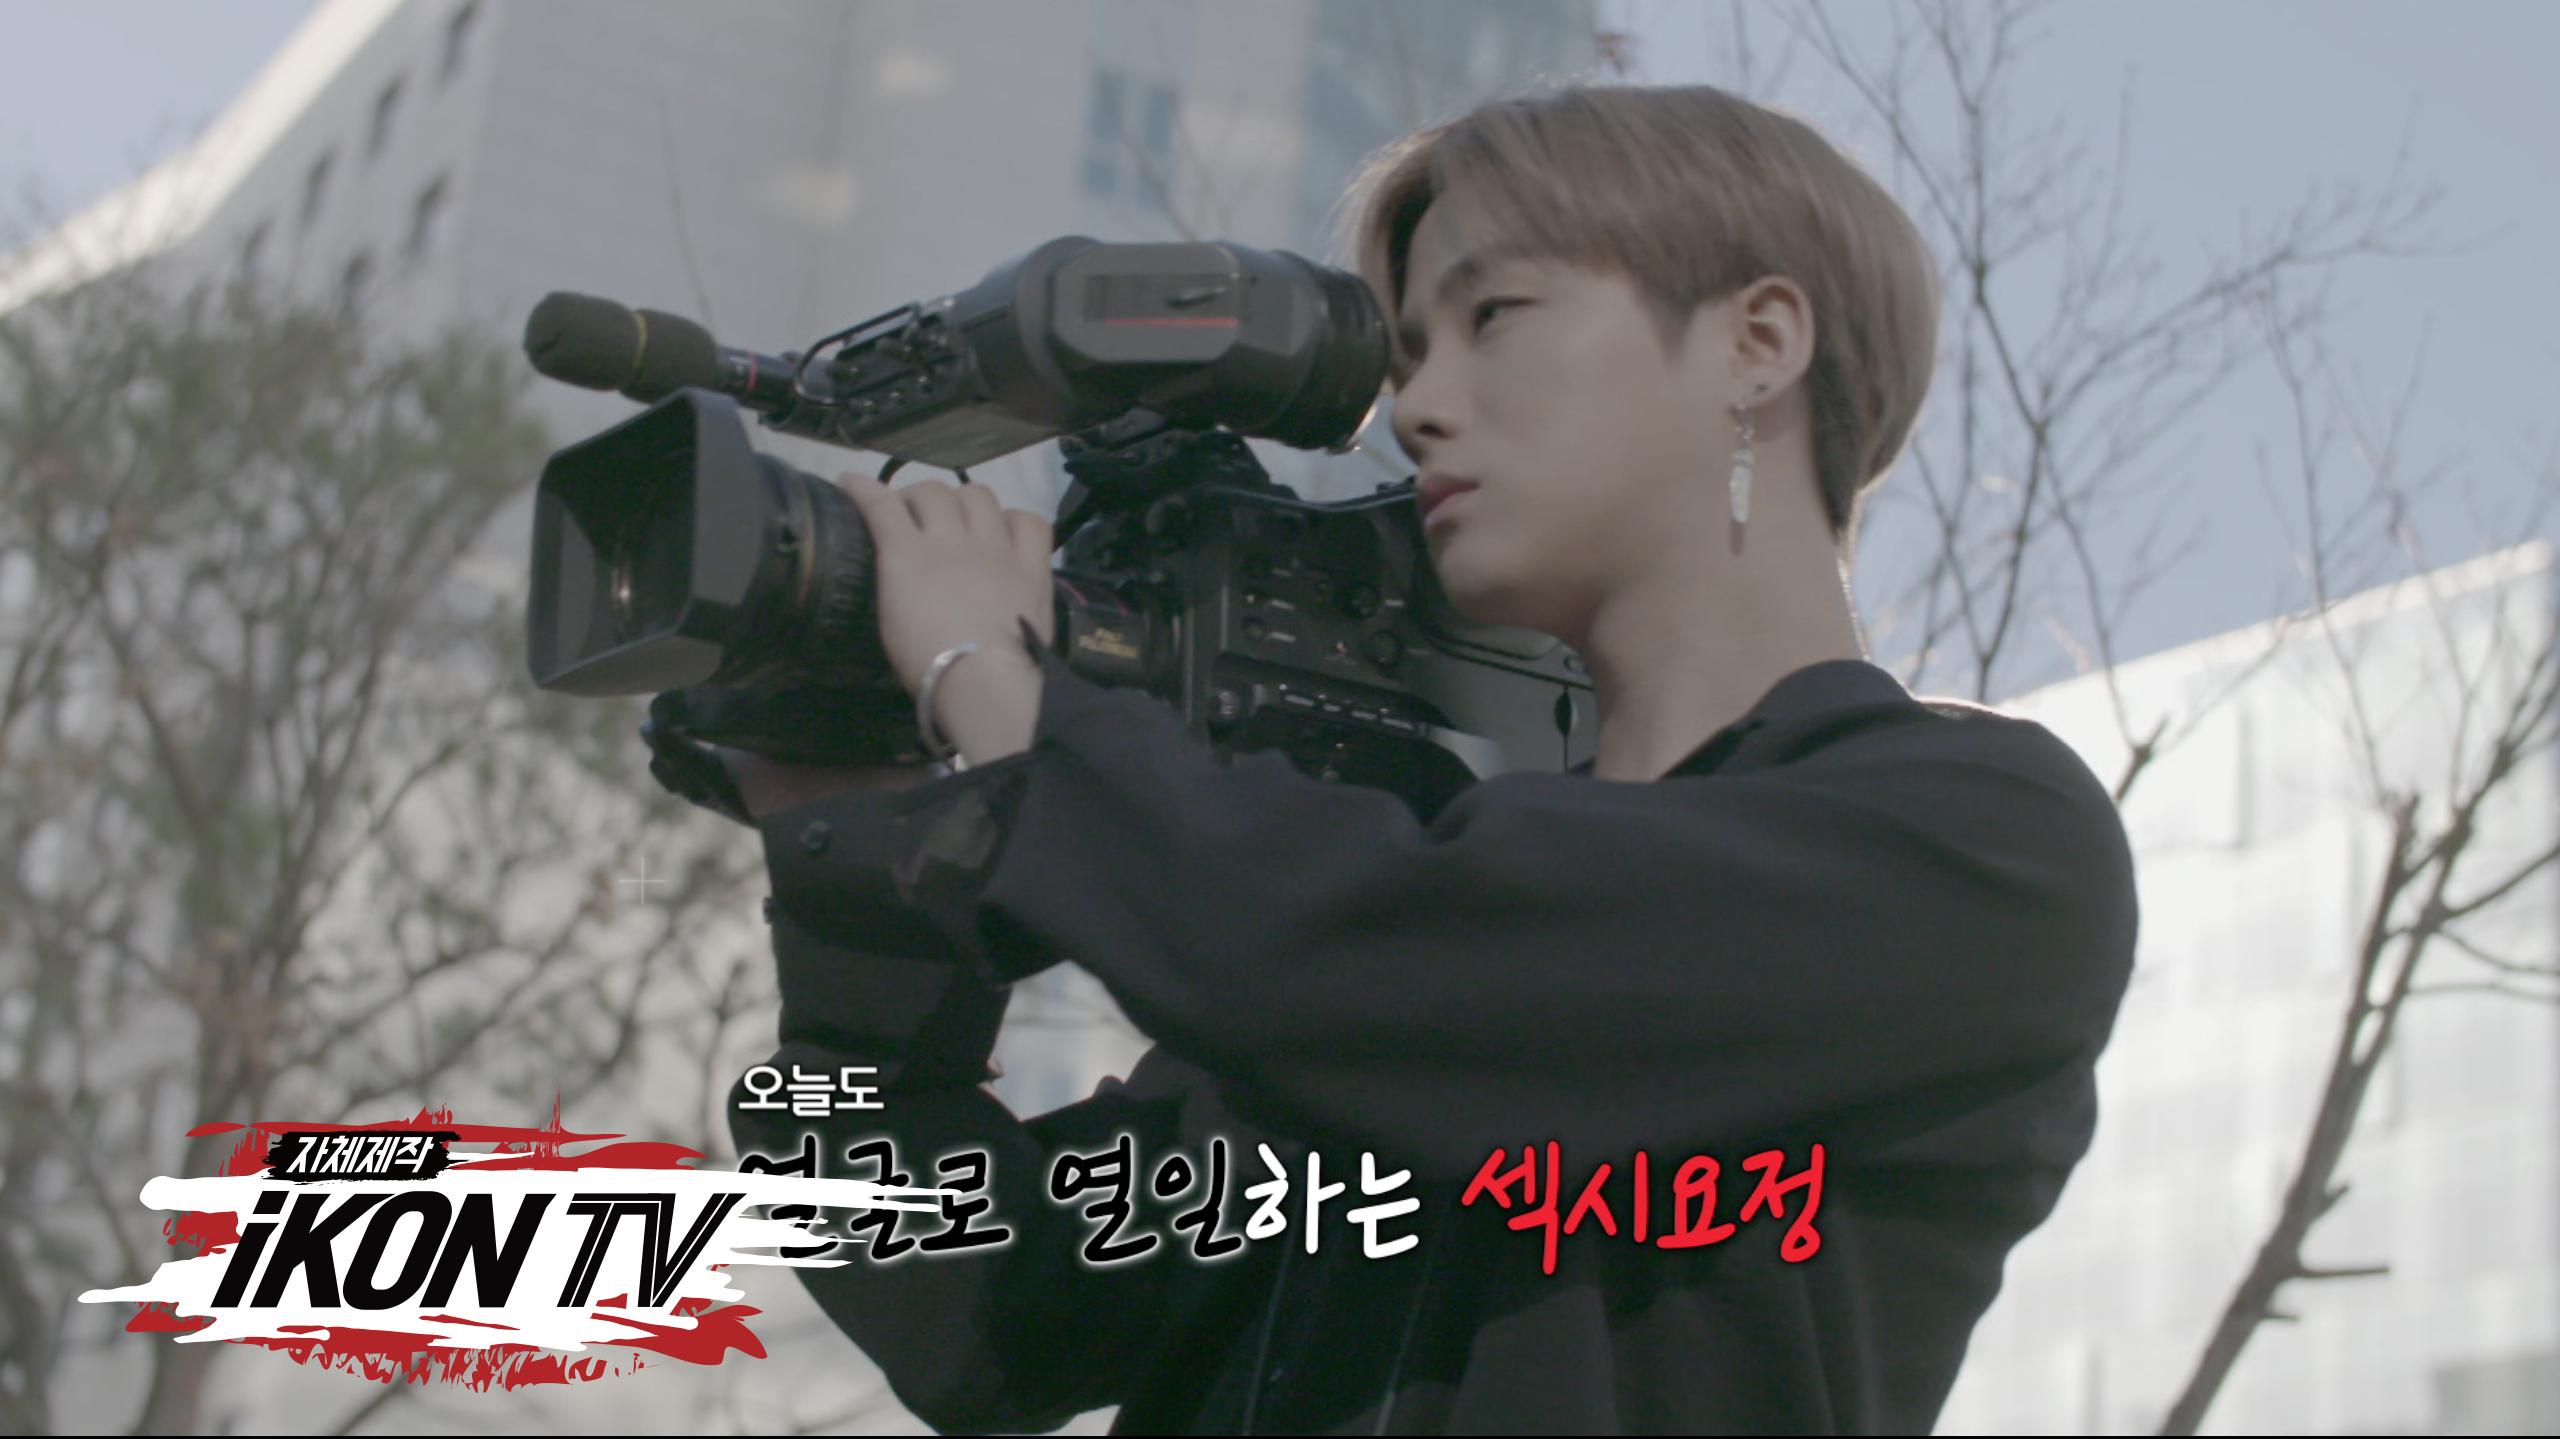 iKON - '자체제작 iKON TV' [PD ver.] TEASER